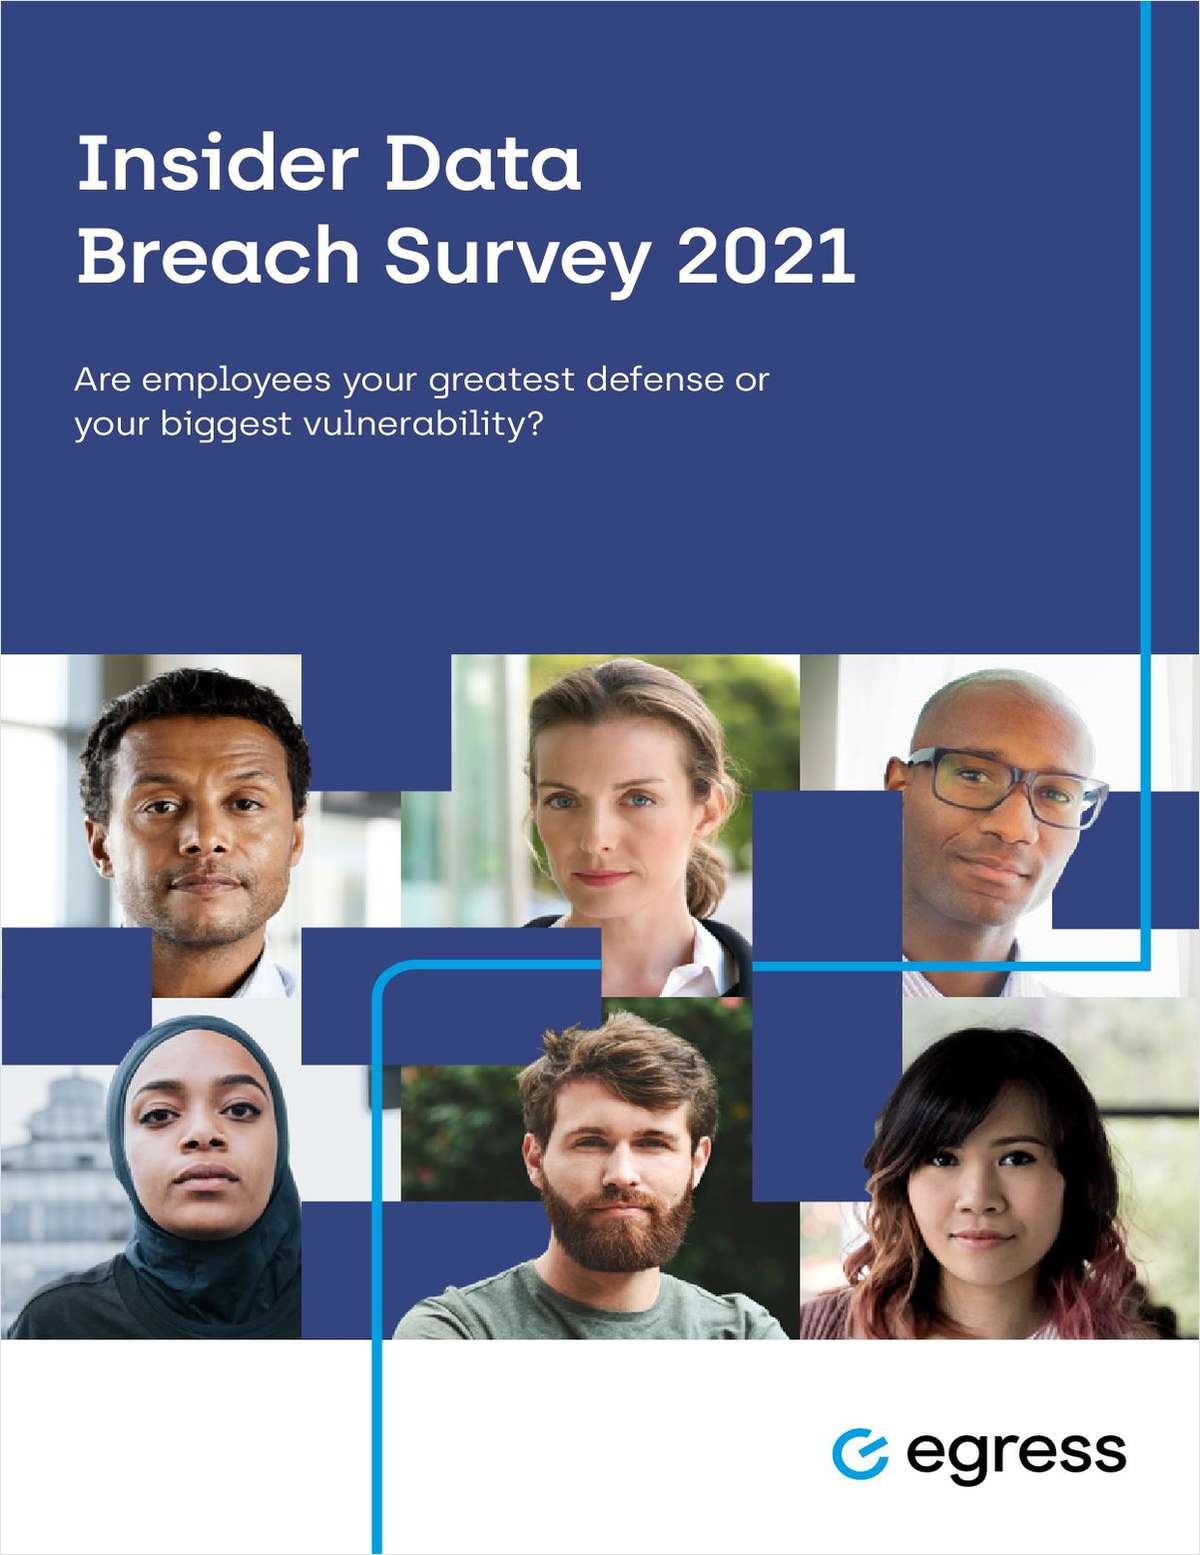 Insider Data Breach Survey 2021